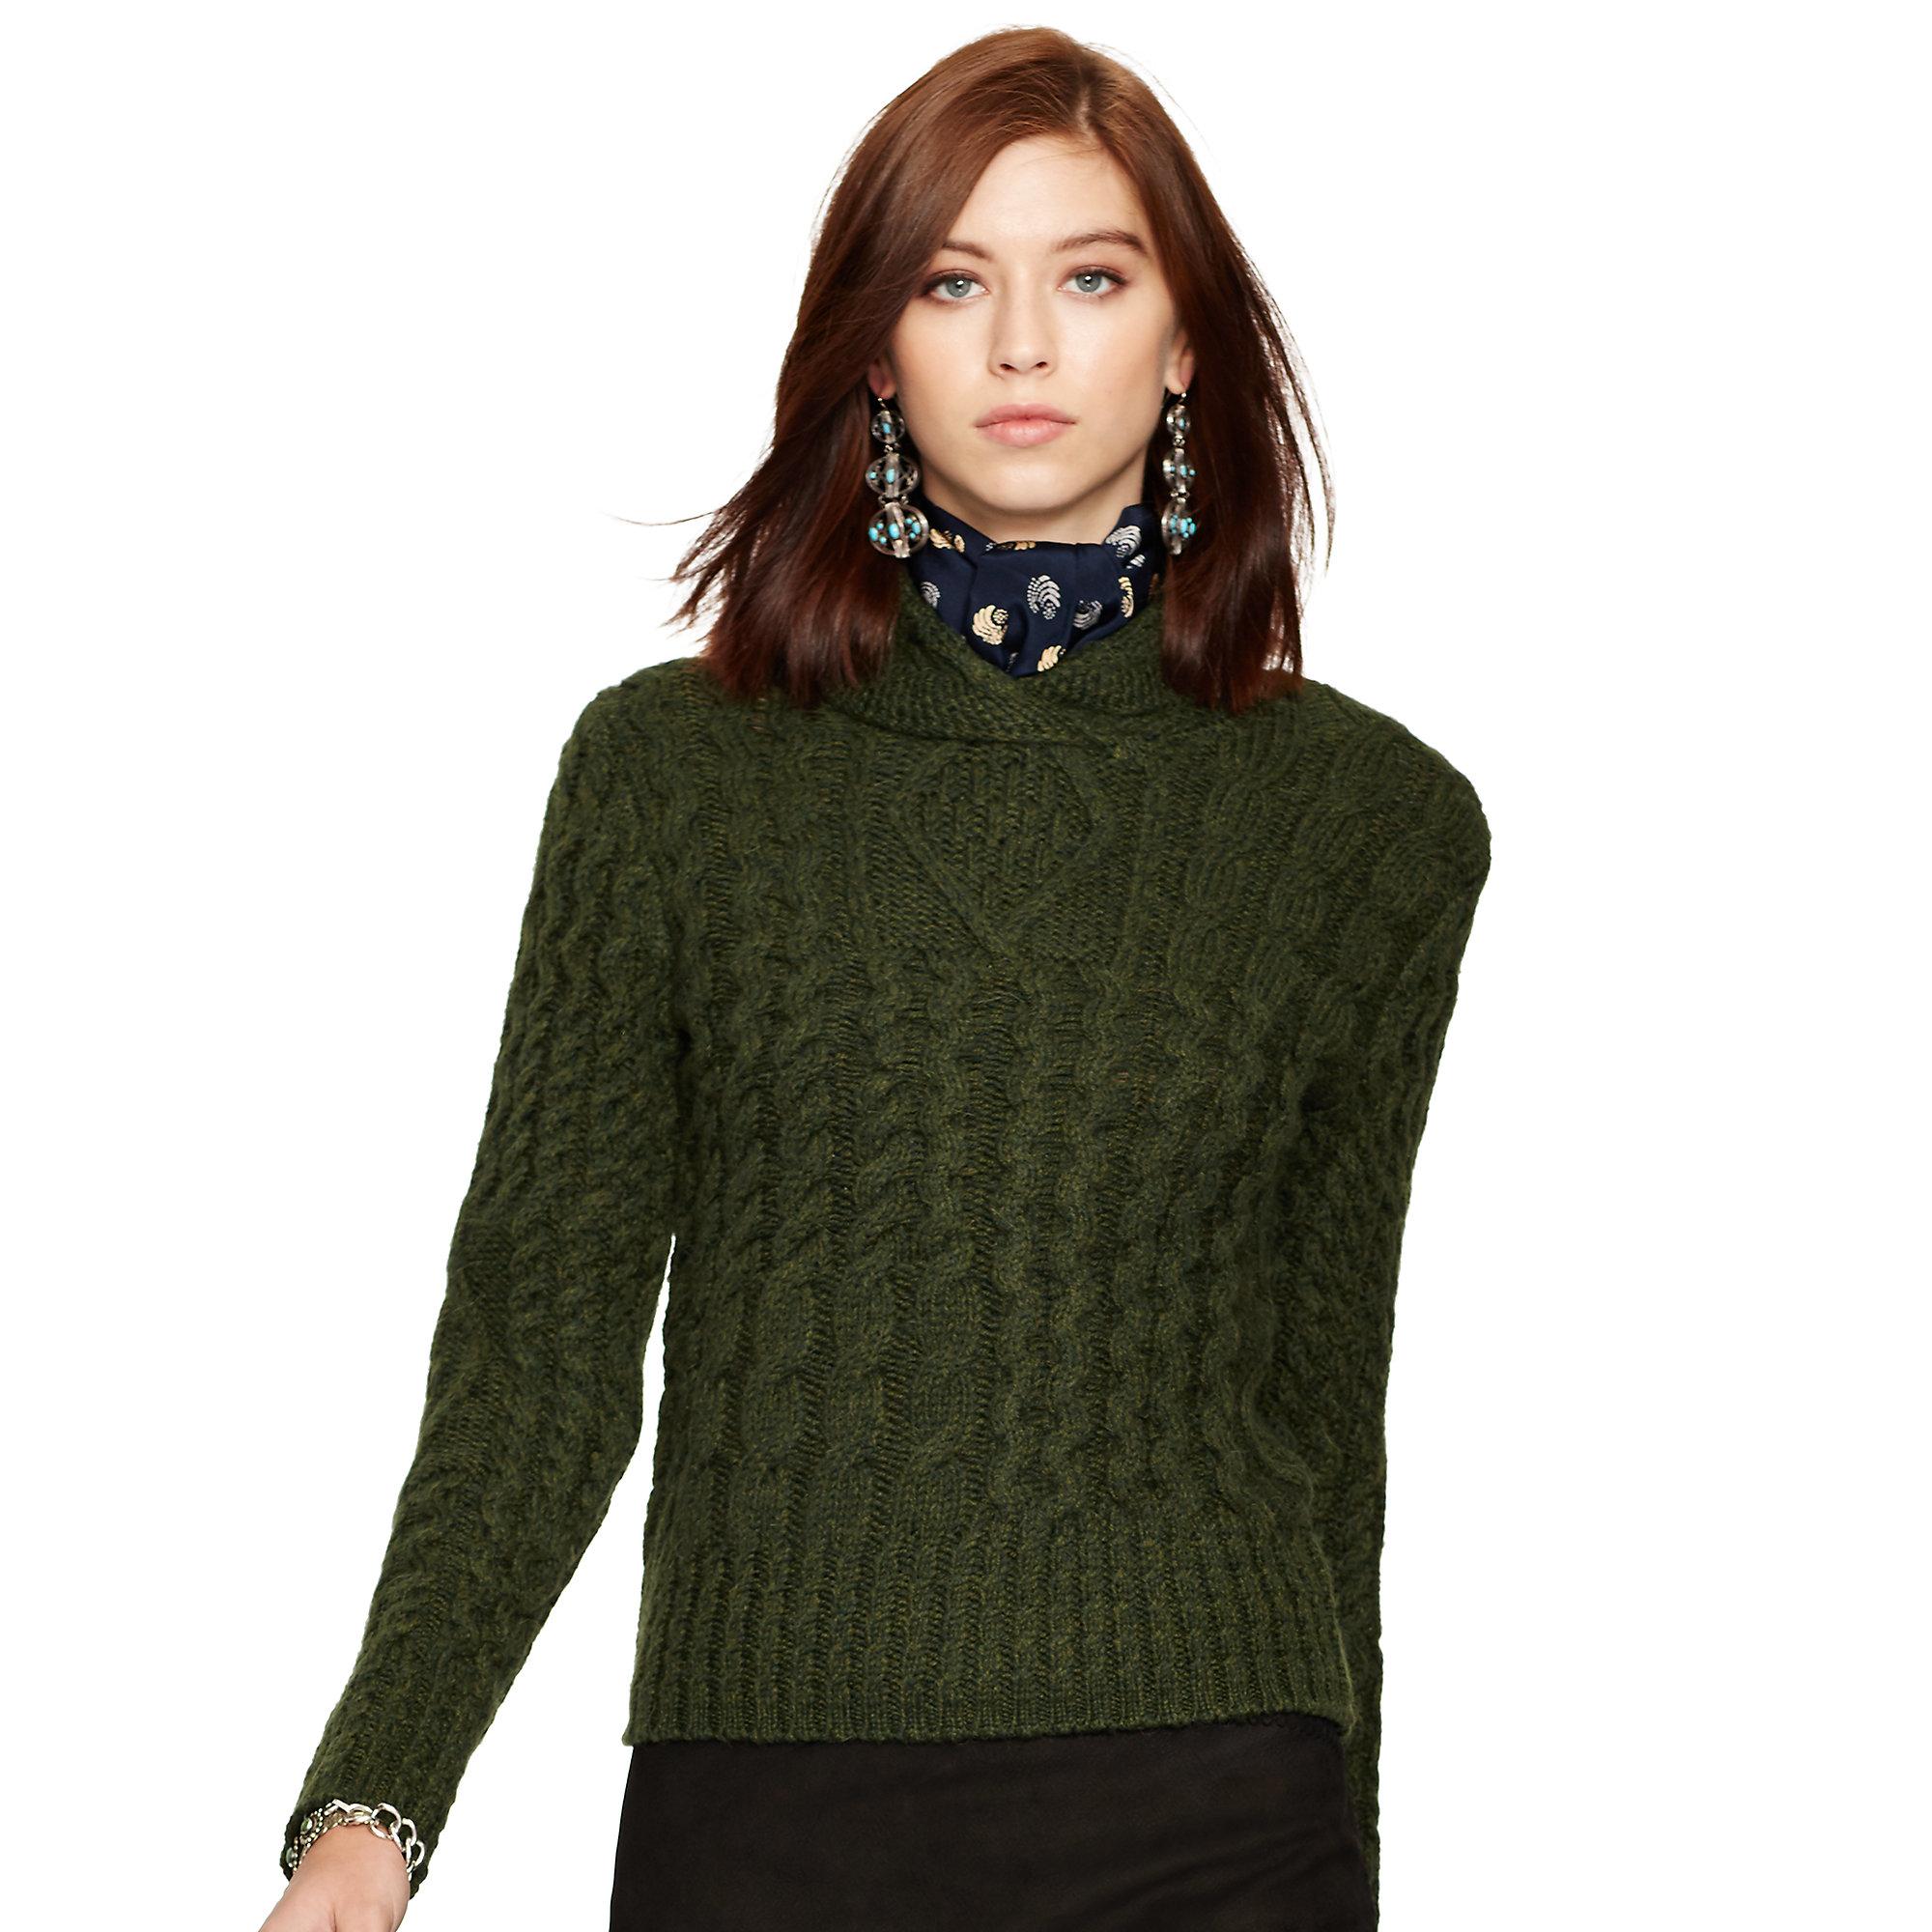 fd5d2a830 ... australia lyst polo ralph lauren wool alpaca cabled sweater in green  d581b b5d95